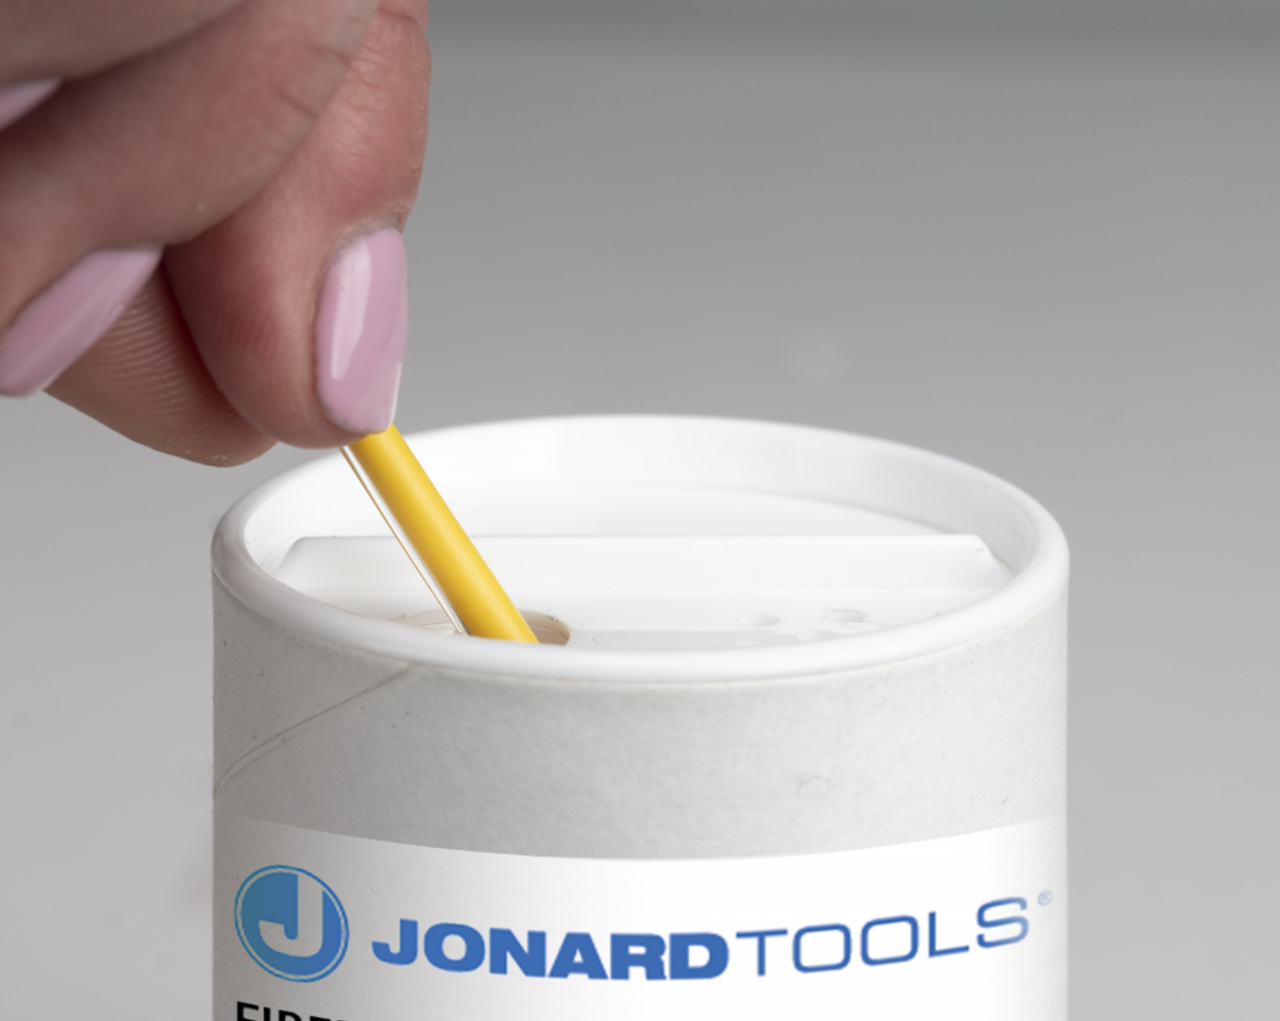 Jonard - Fiber Scraps Disposal Can - FDC-66